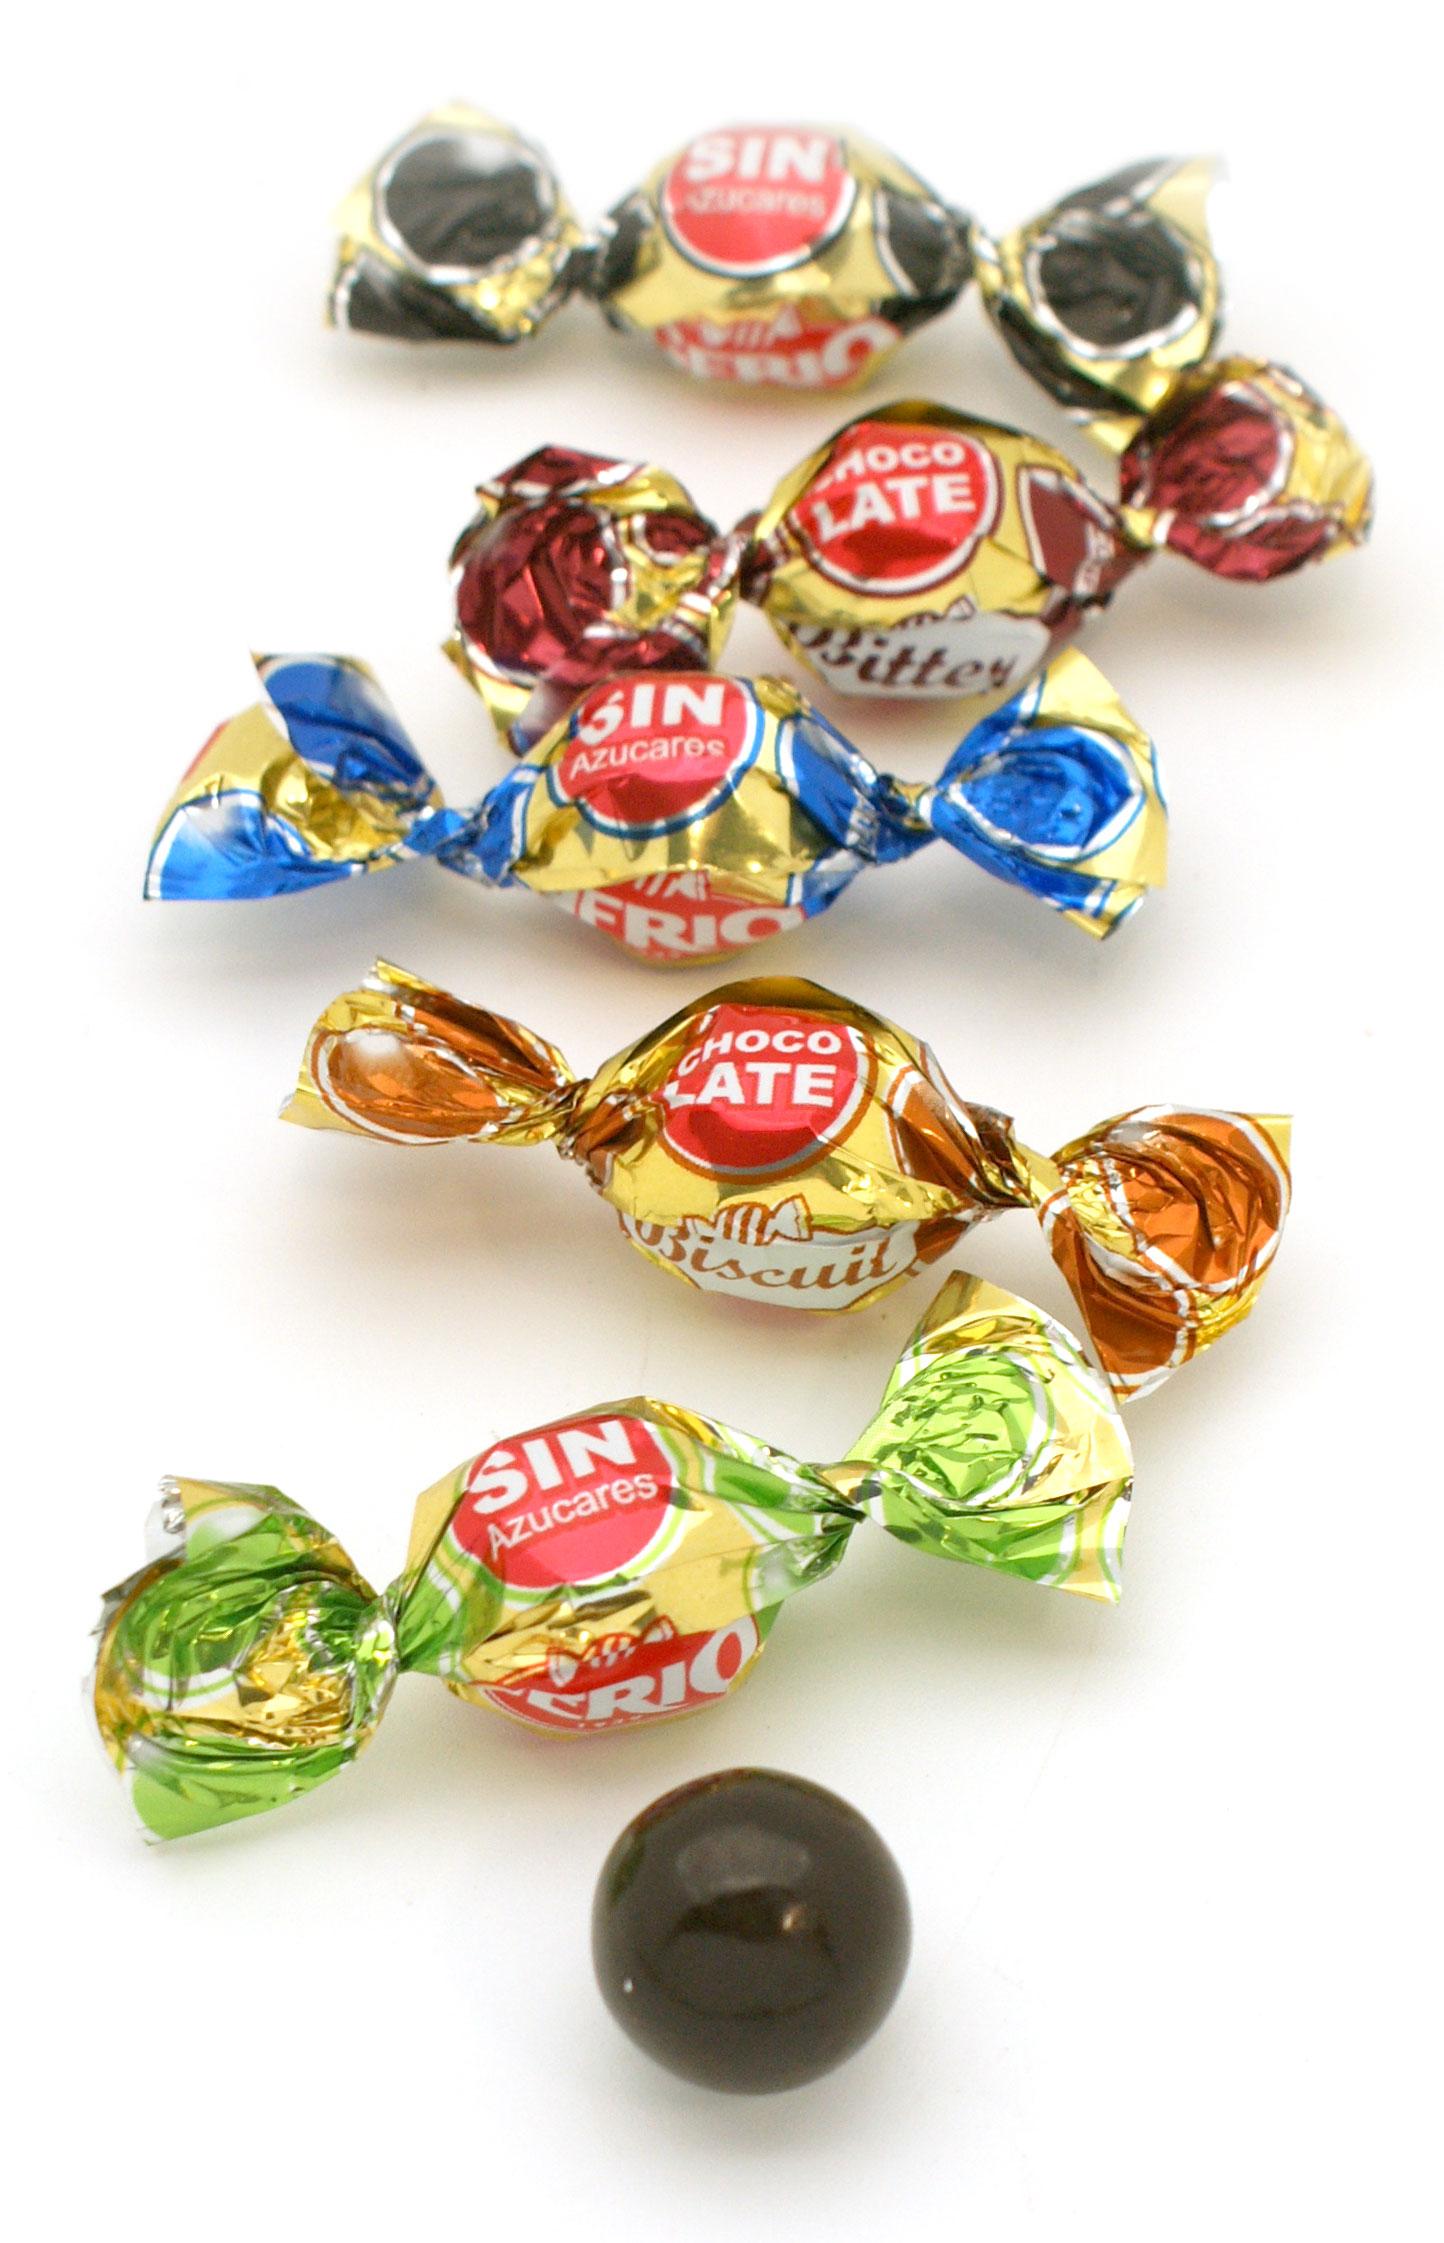 Surtido de bombones sin azúcar